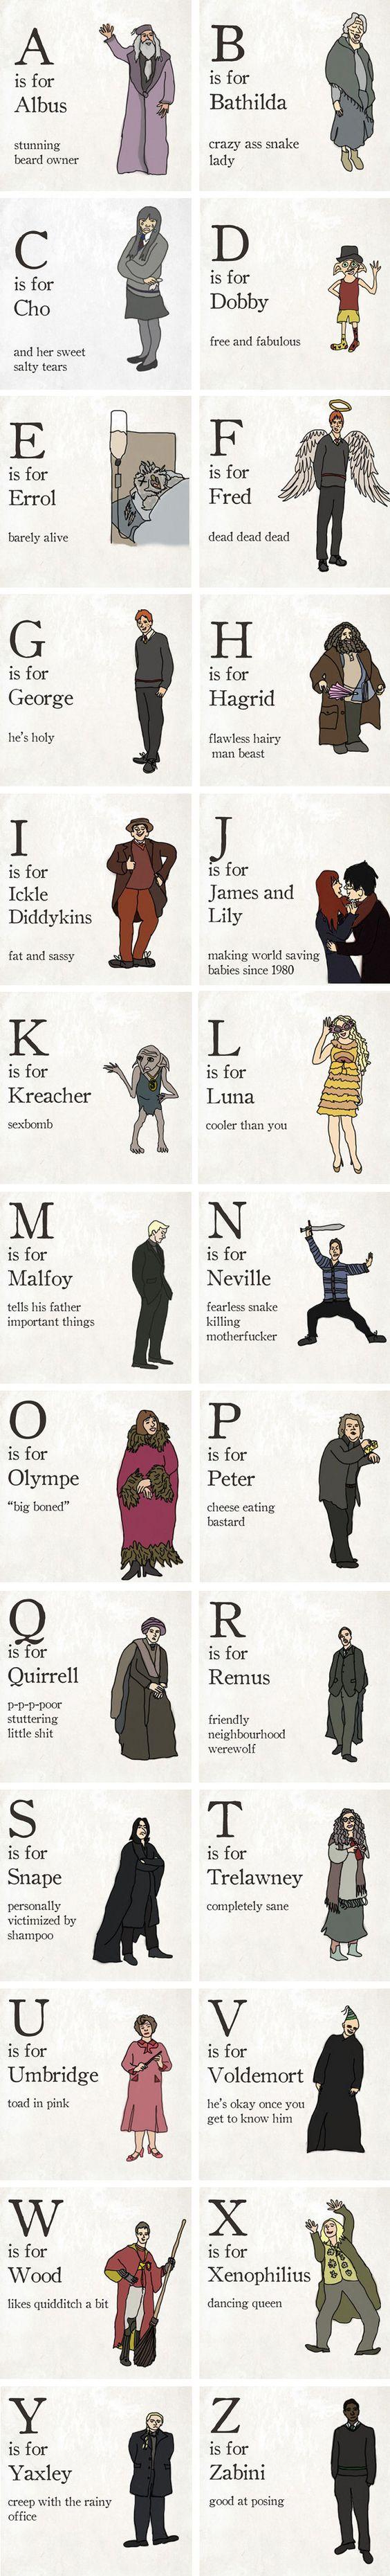 alfabeto harry potter completo